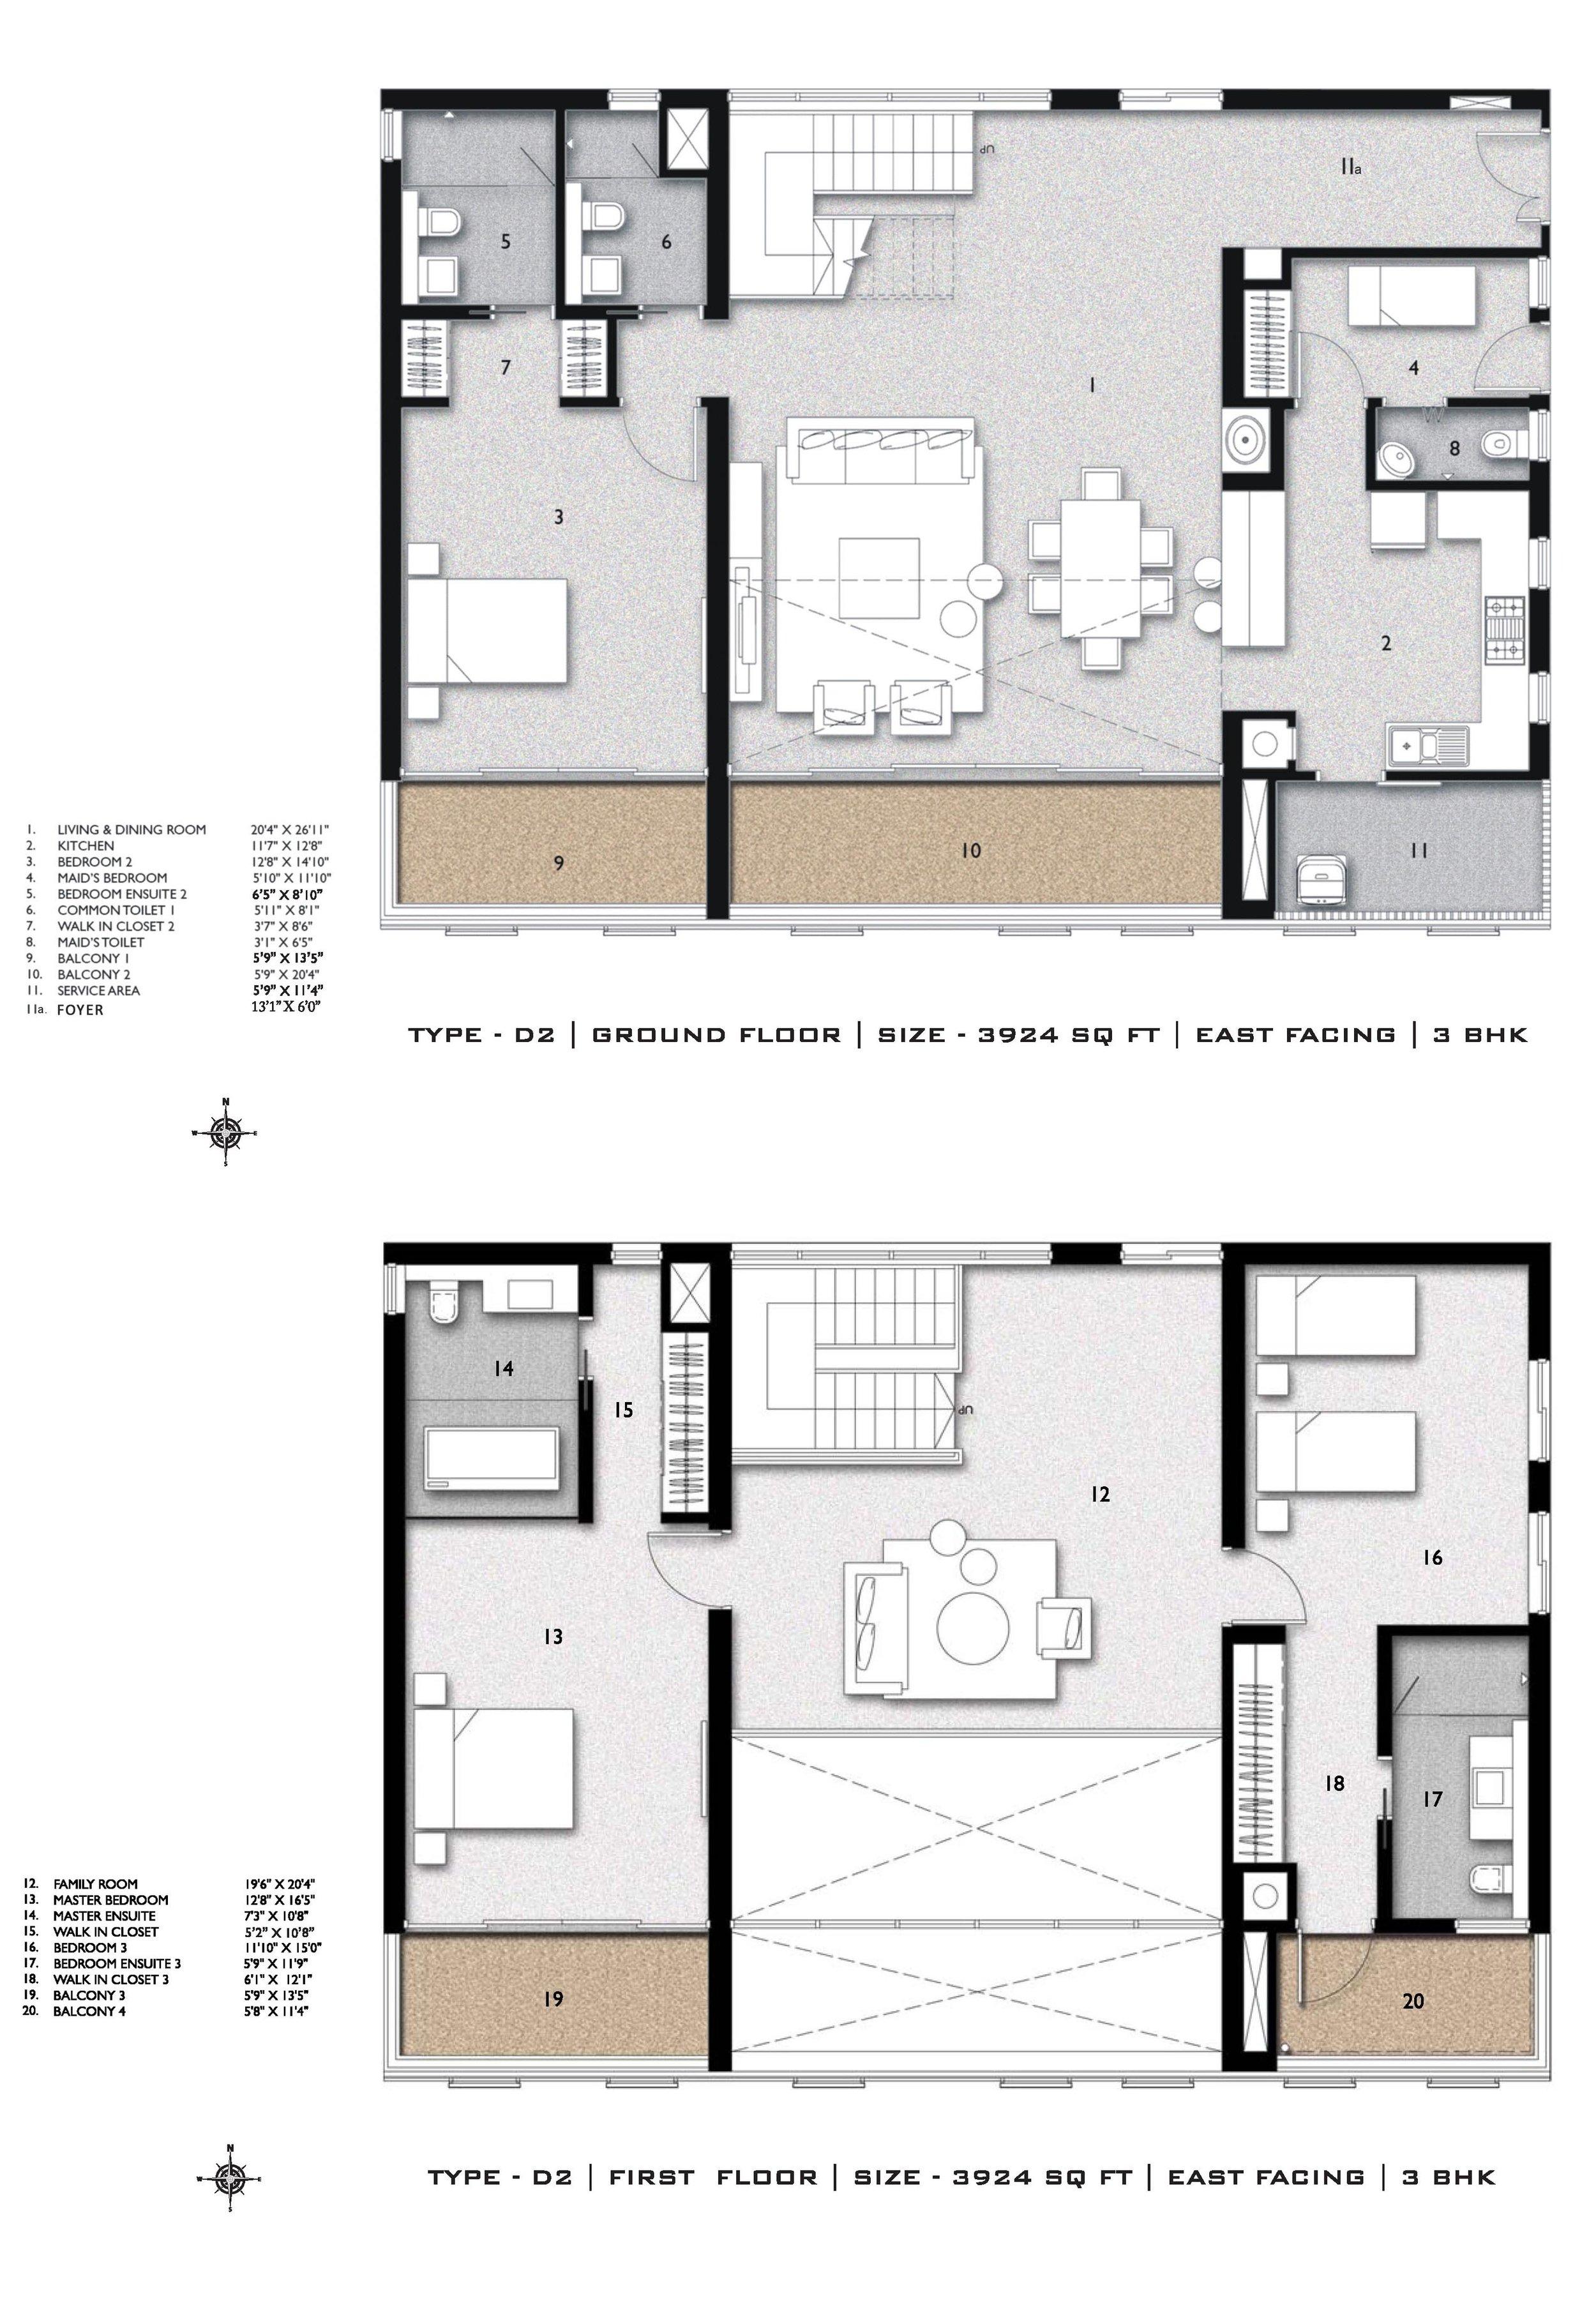 Duplex_3924 sft.jpg